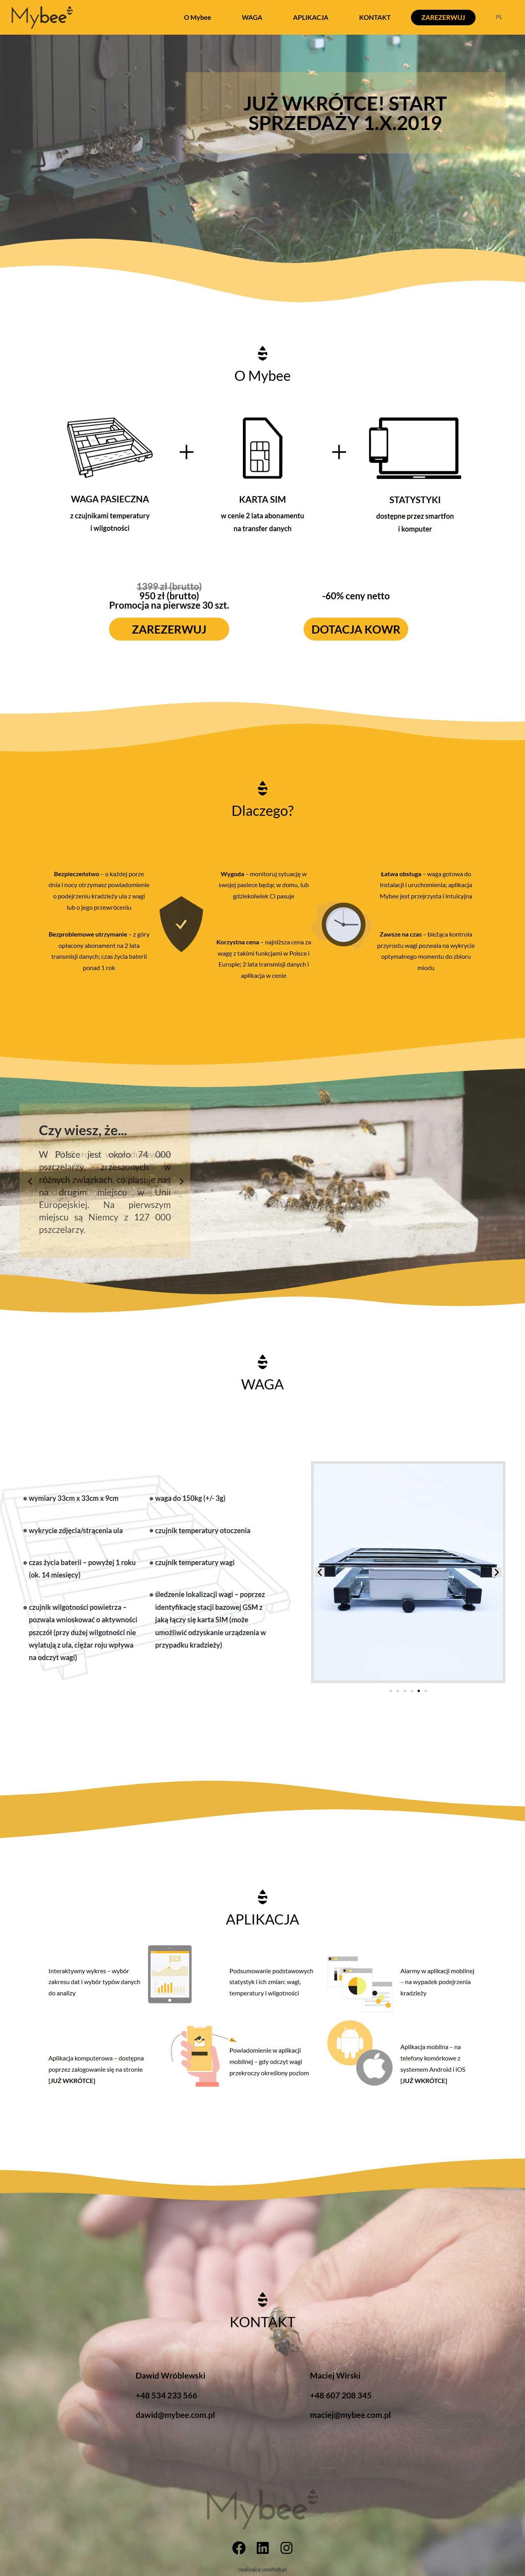 mybee strona internetowa